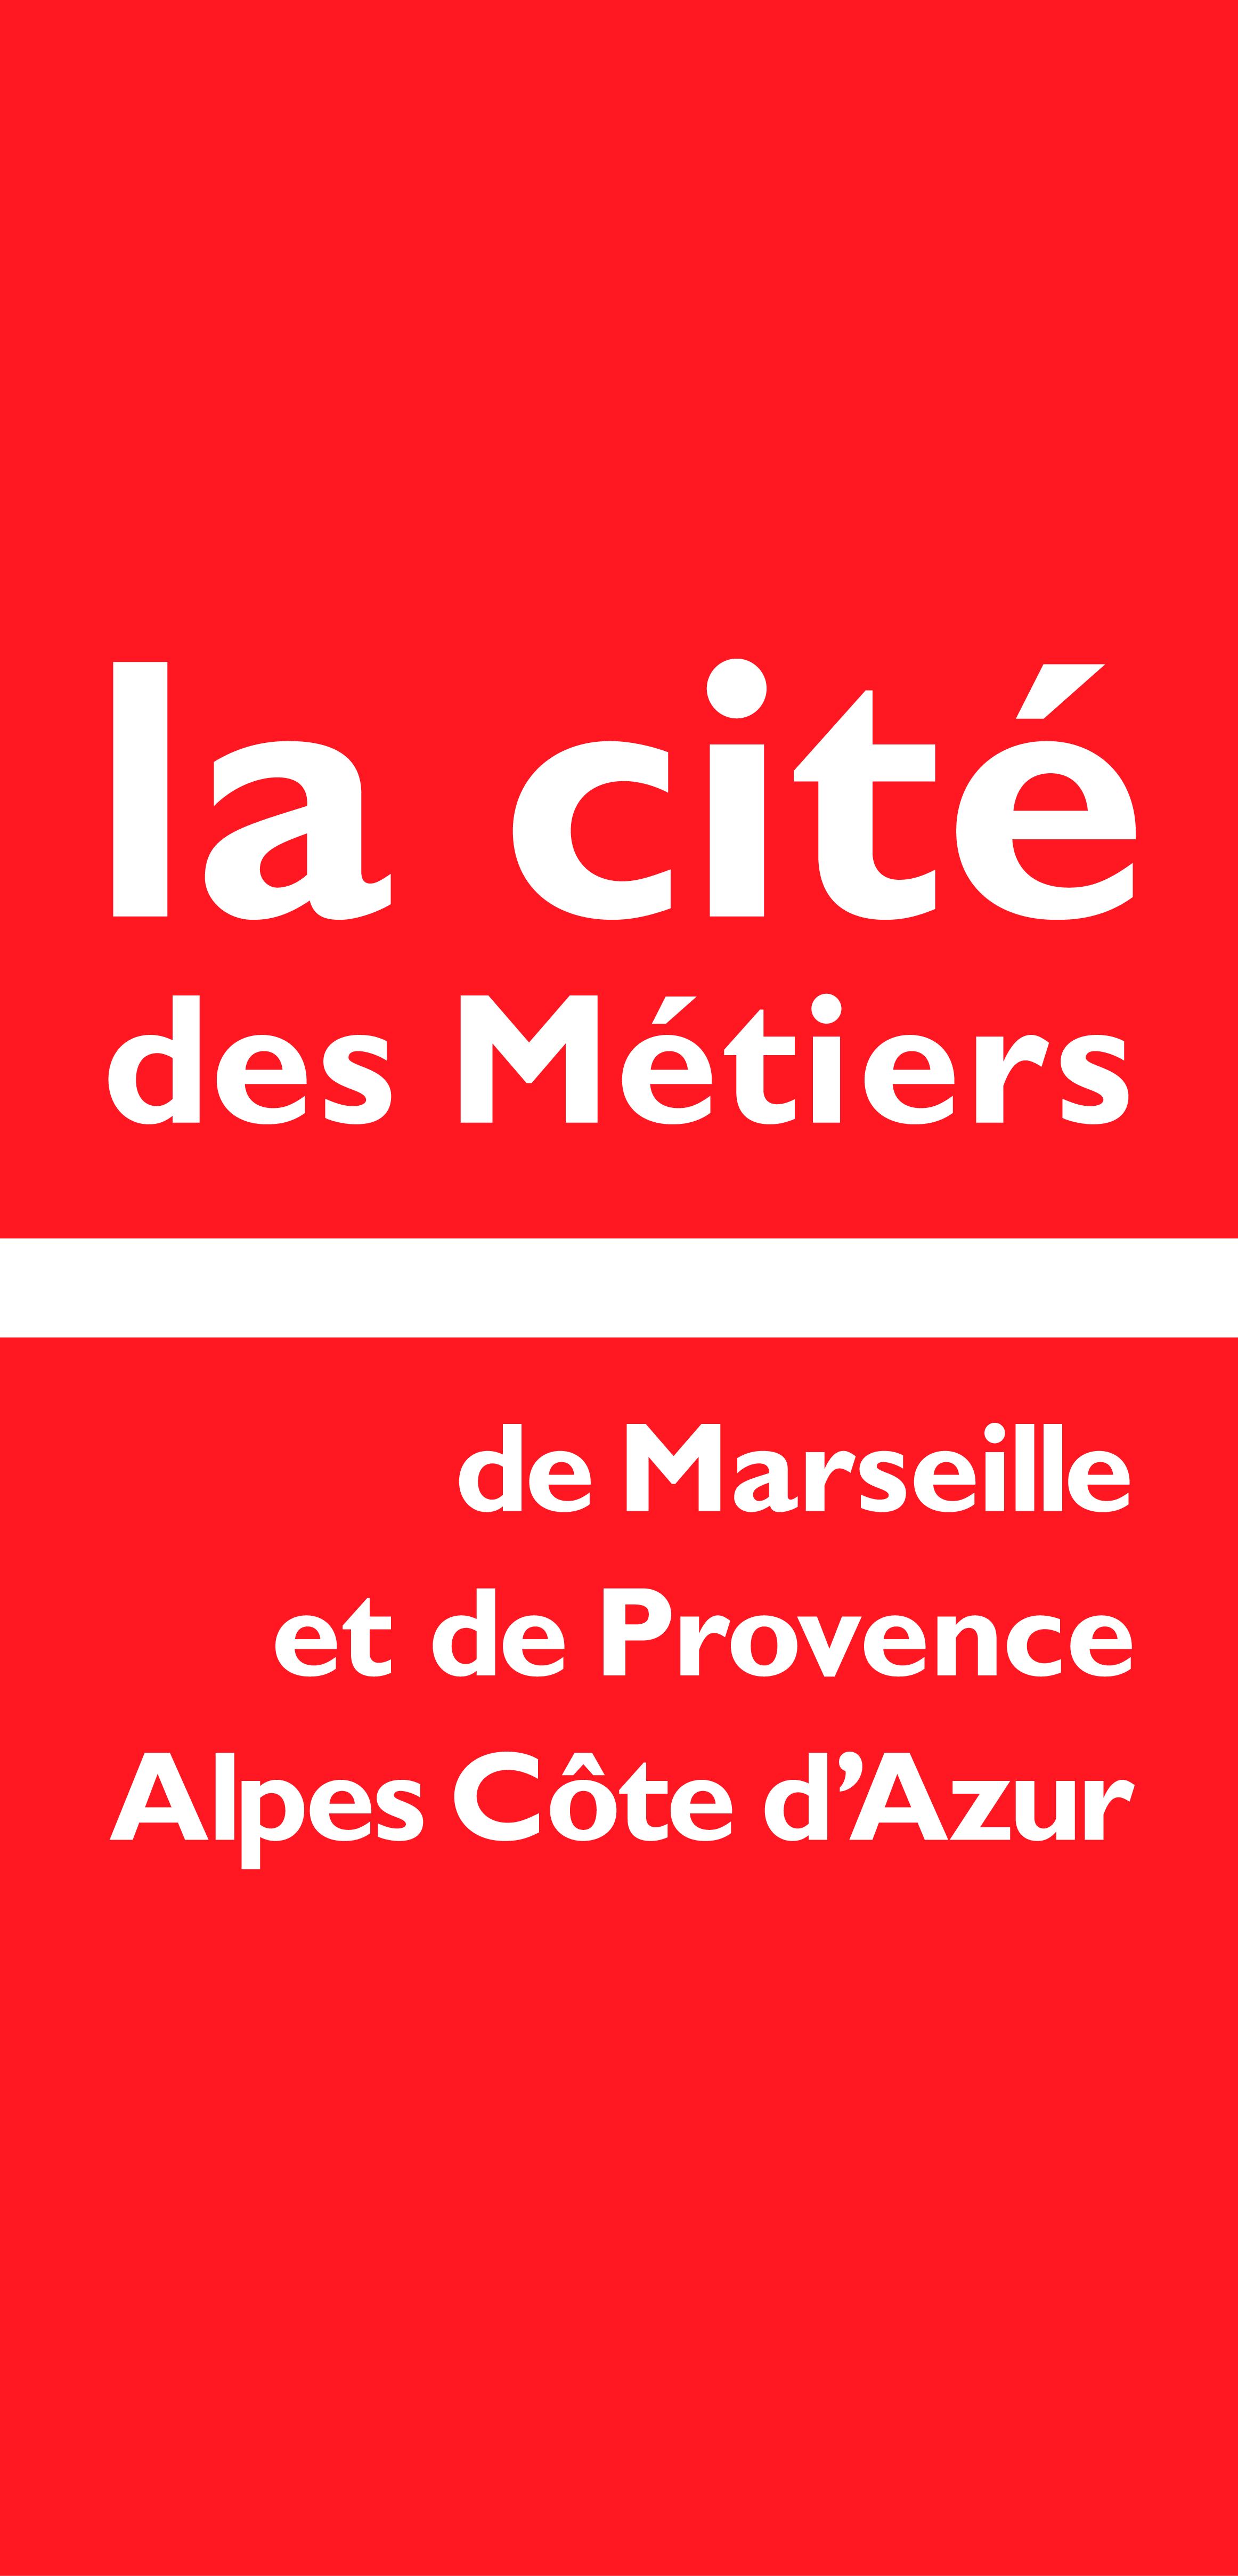 Logo-cite-des-metiers-paca